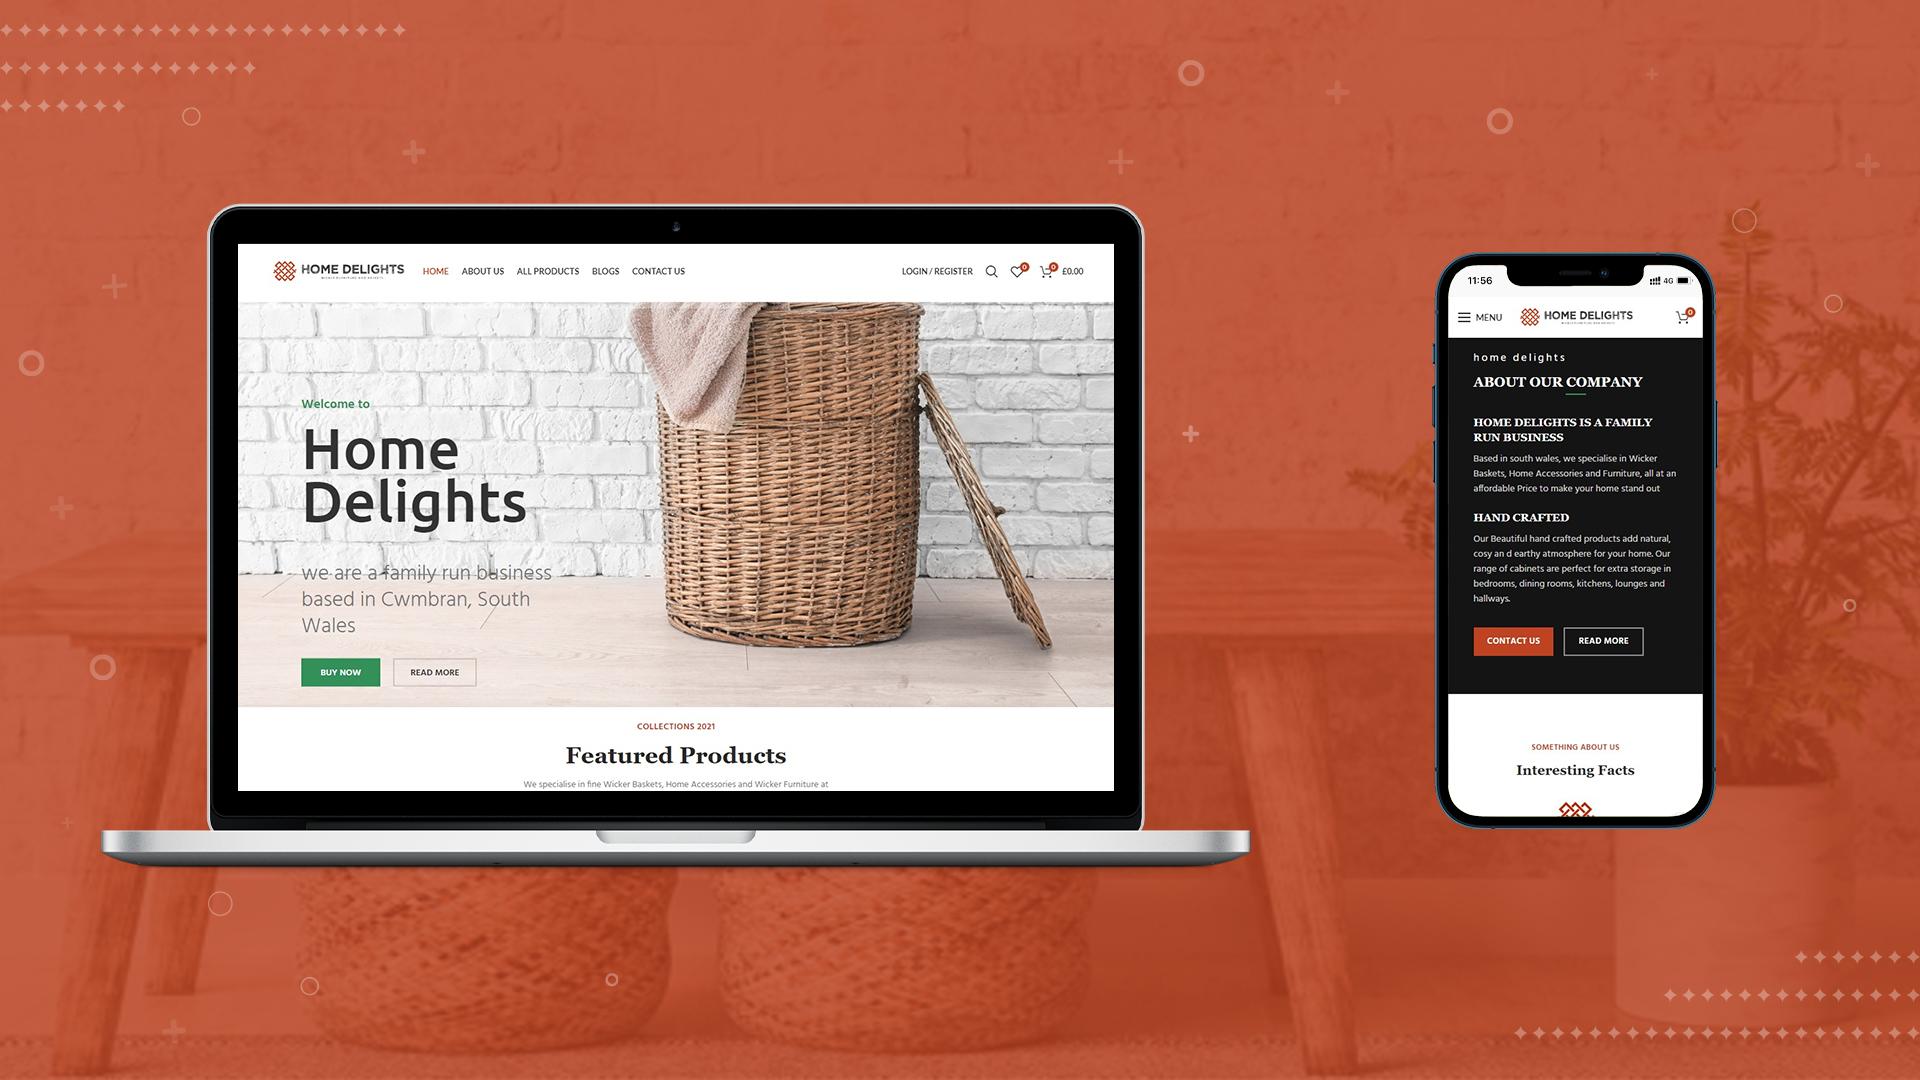 WordPress based eCommerce webiste